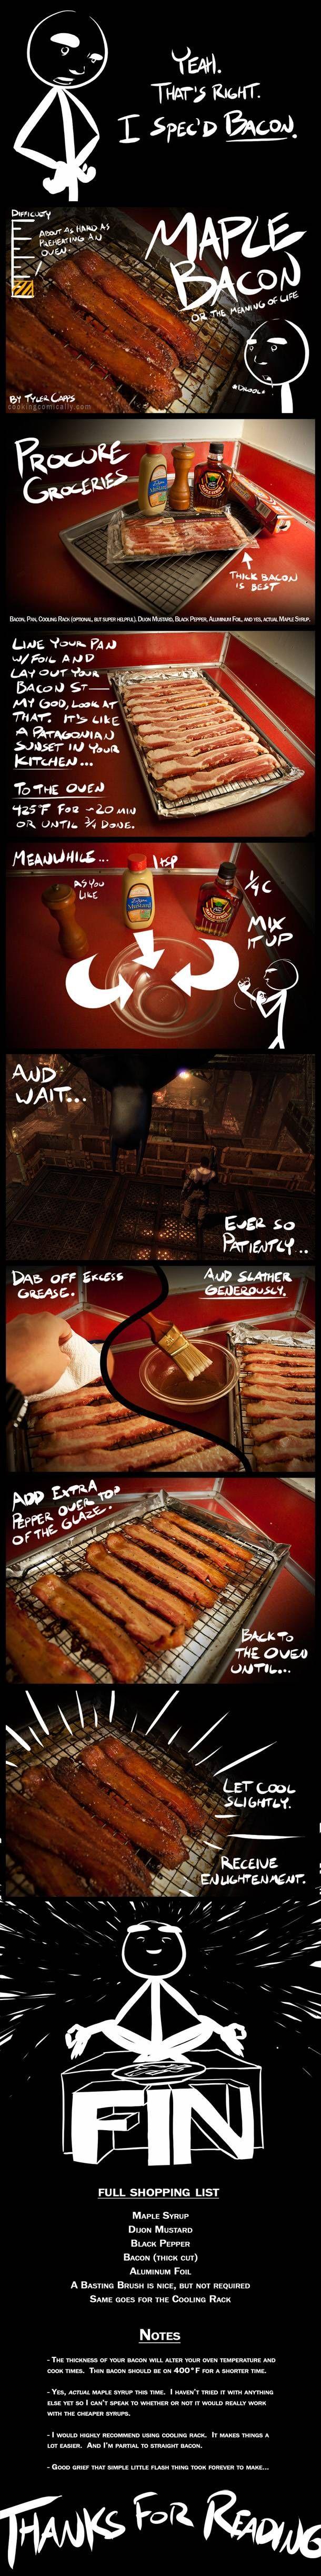 Maple Bacon - cooking comically version.